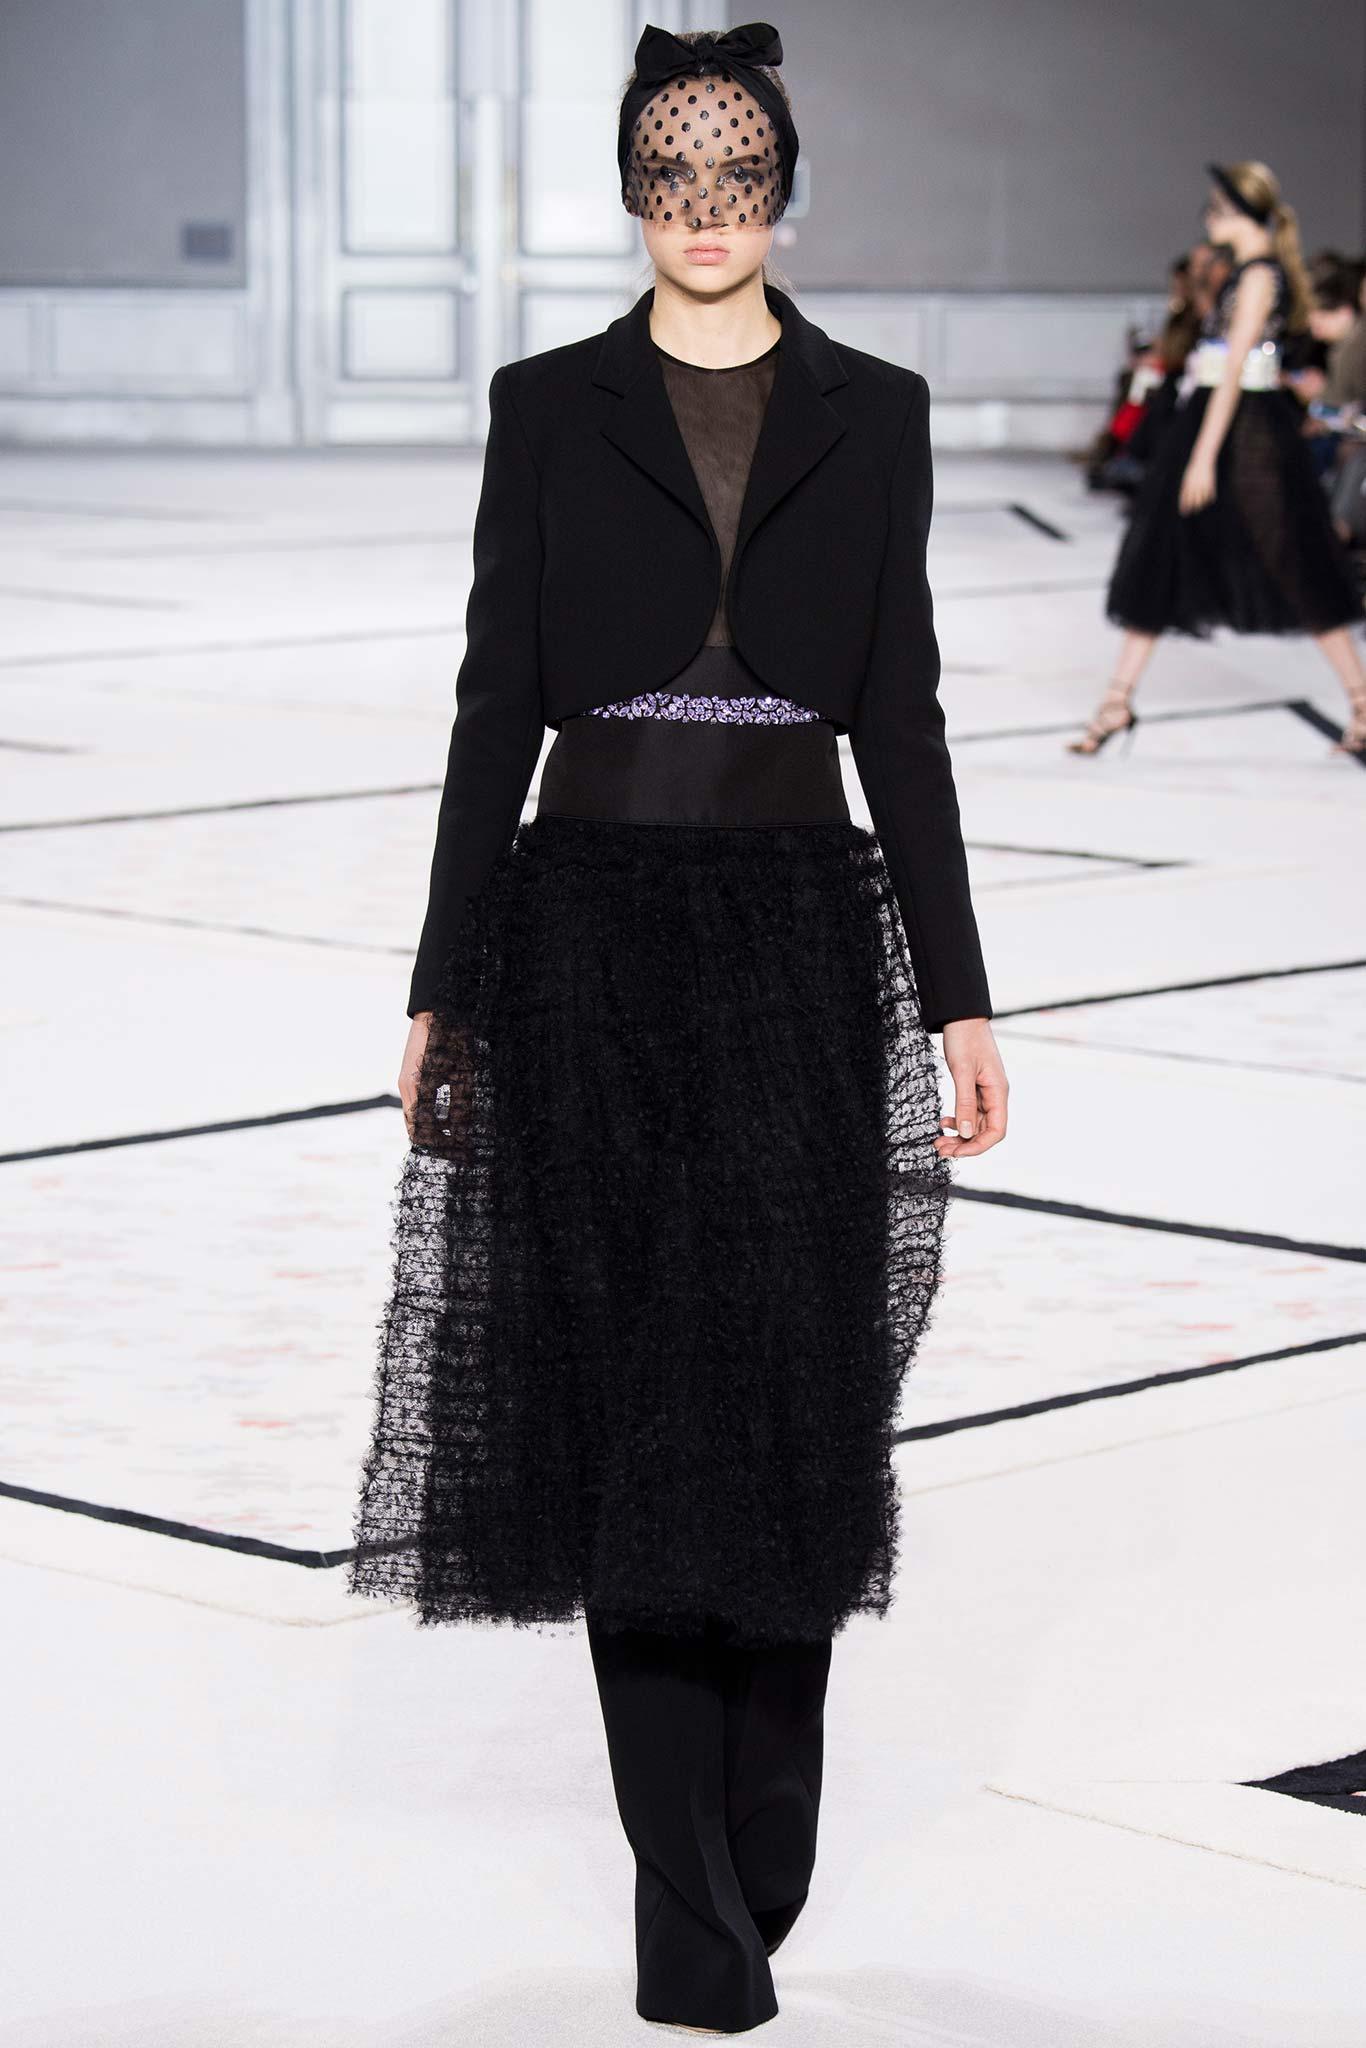 Giambattista Valli Spring/Summer 2015 Couture